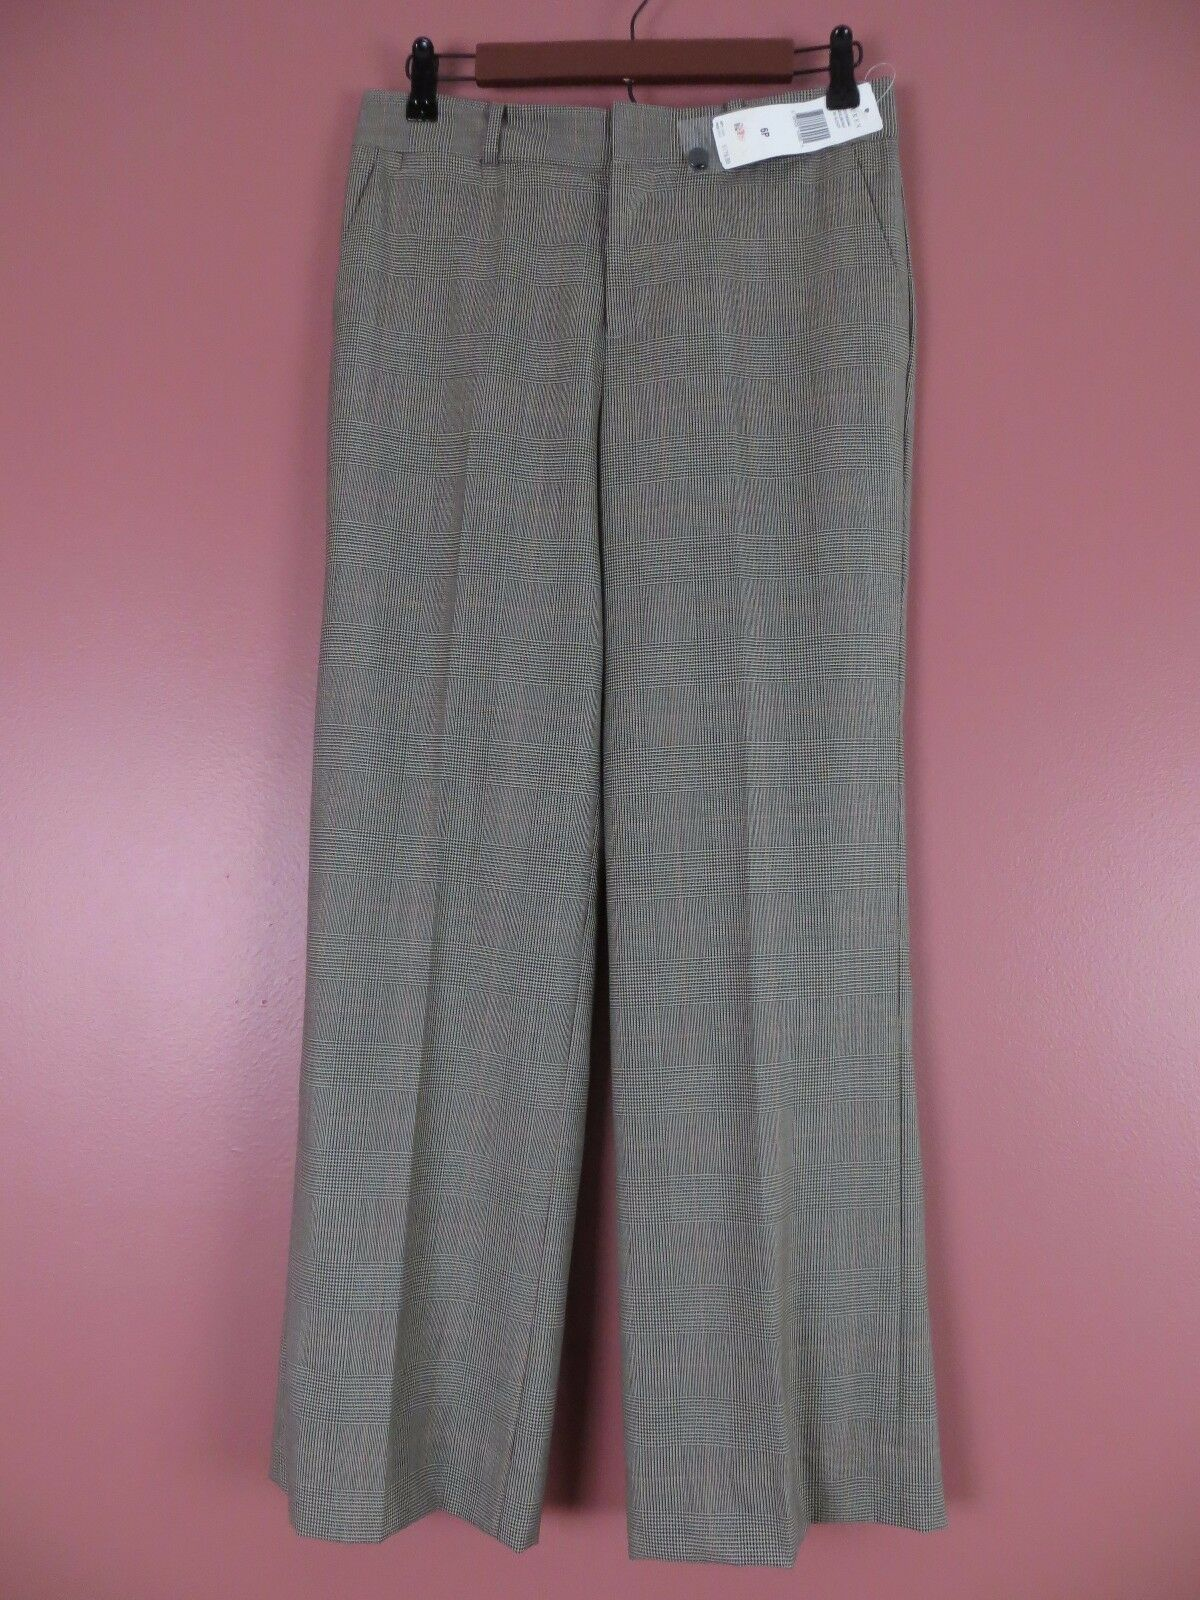 PNS0517- NWT RALPH LAUREN Woman 100% Seasonless Wool Dress Pants Plaids 6P